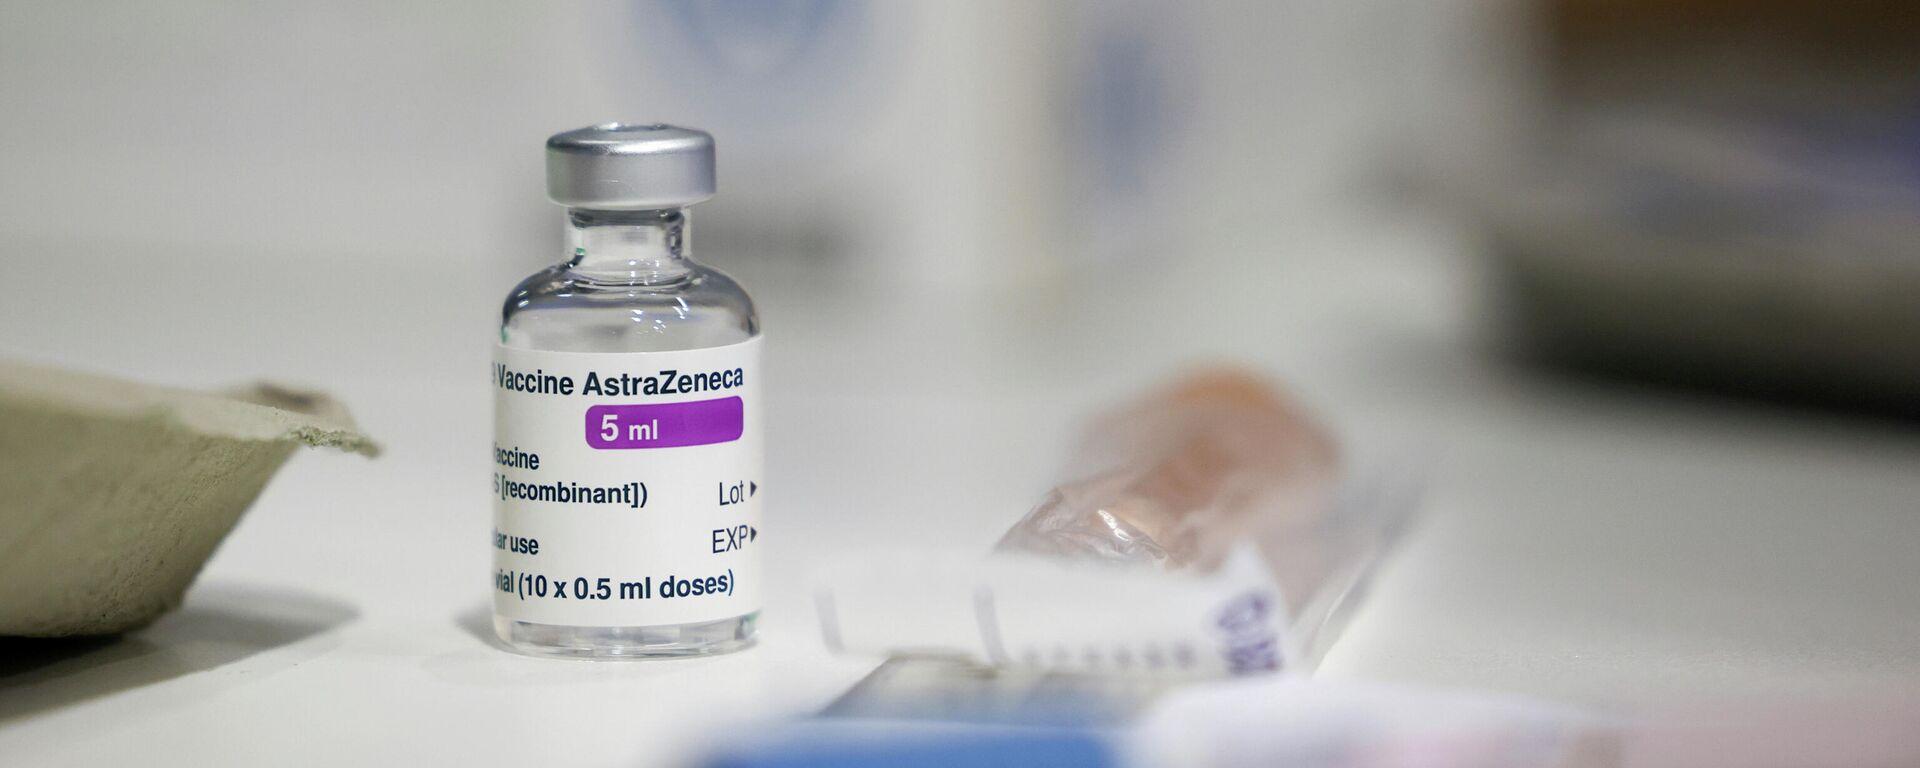 La vacuna contra el COVID-19 de AstraZeneca - Sputnik Mundo, 1920, 12.03.2021